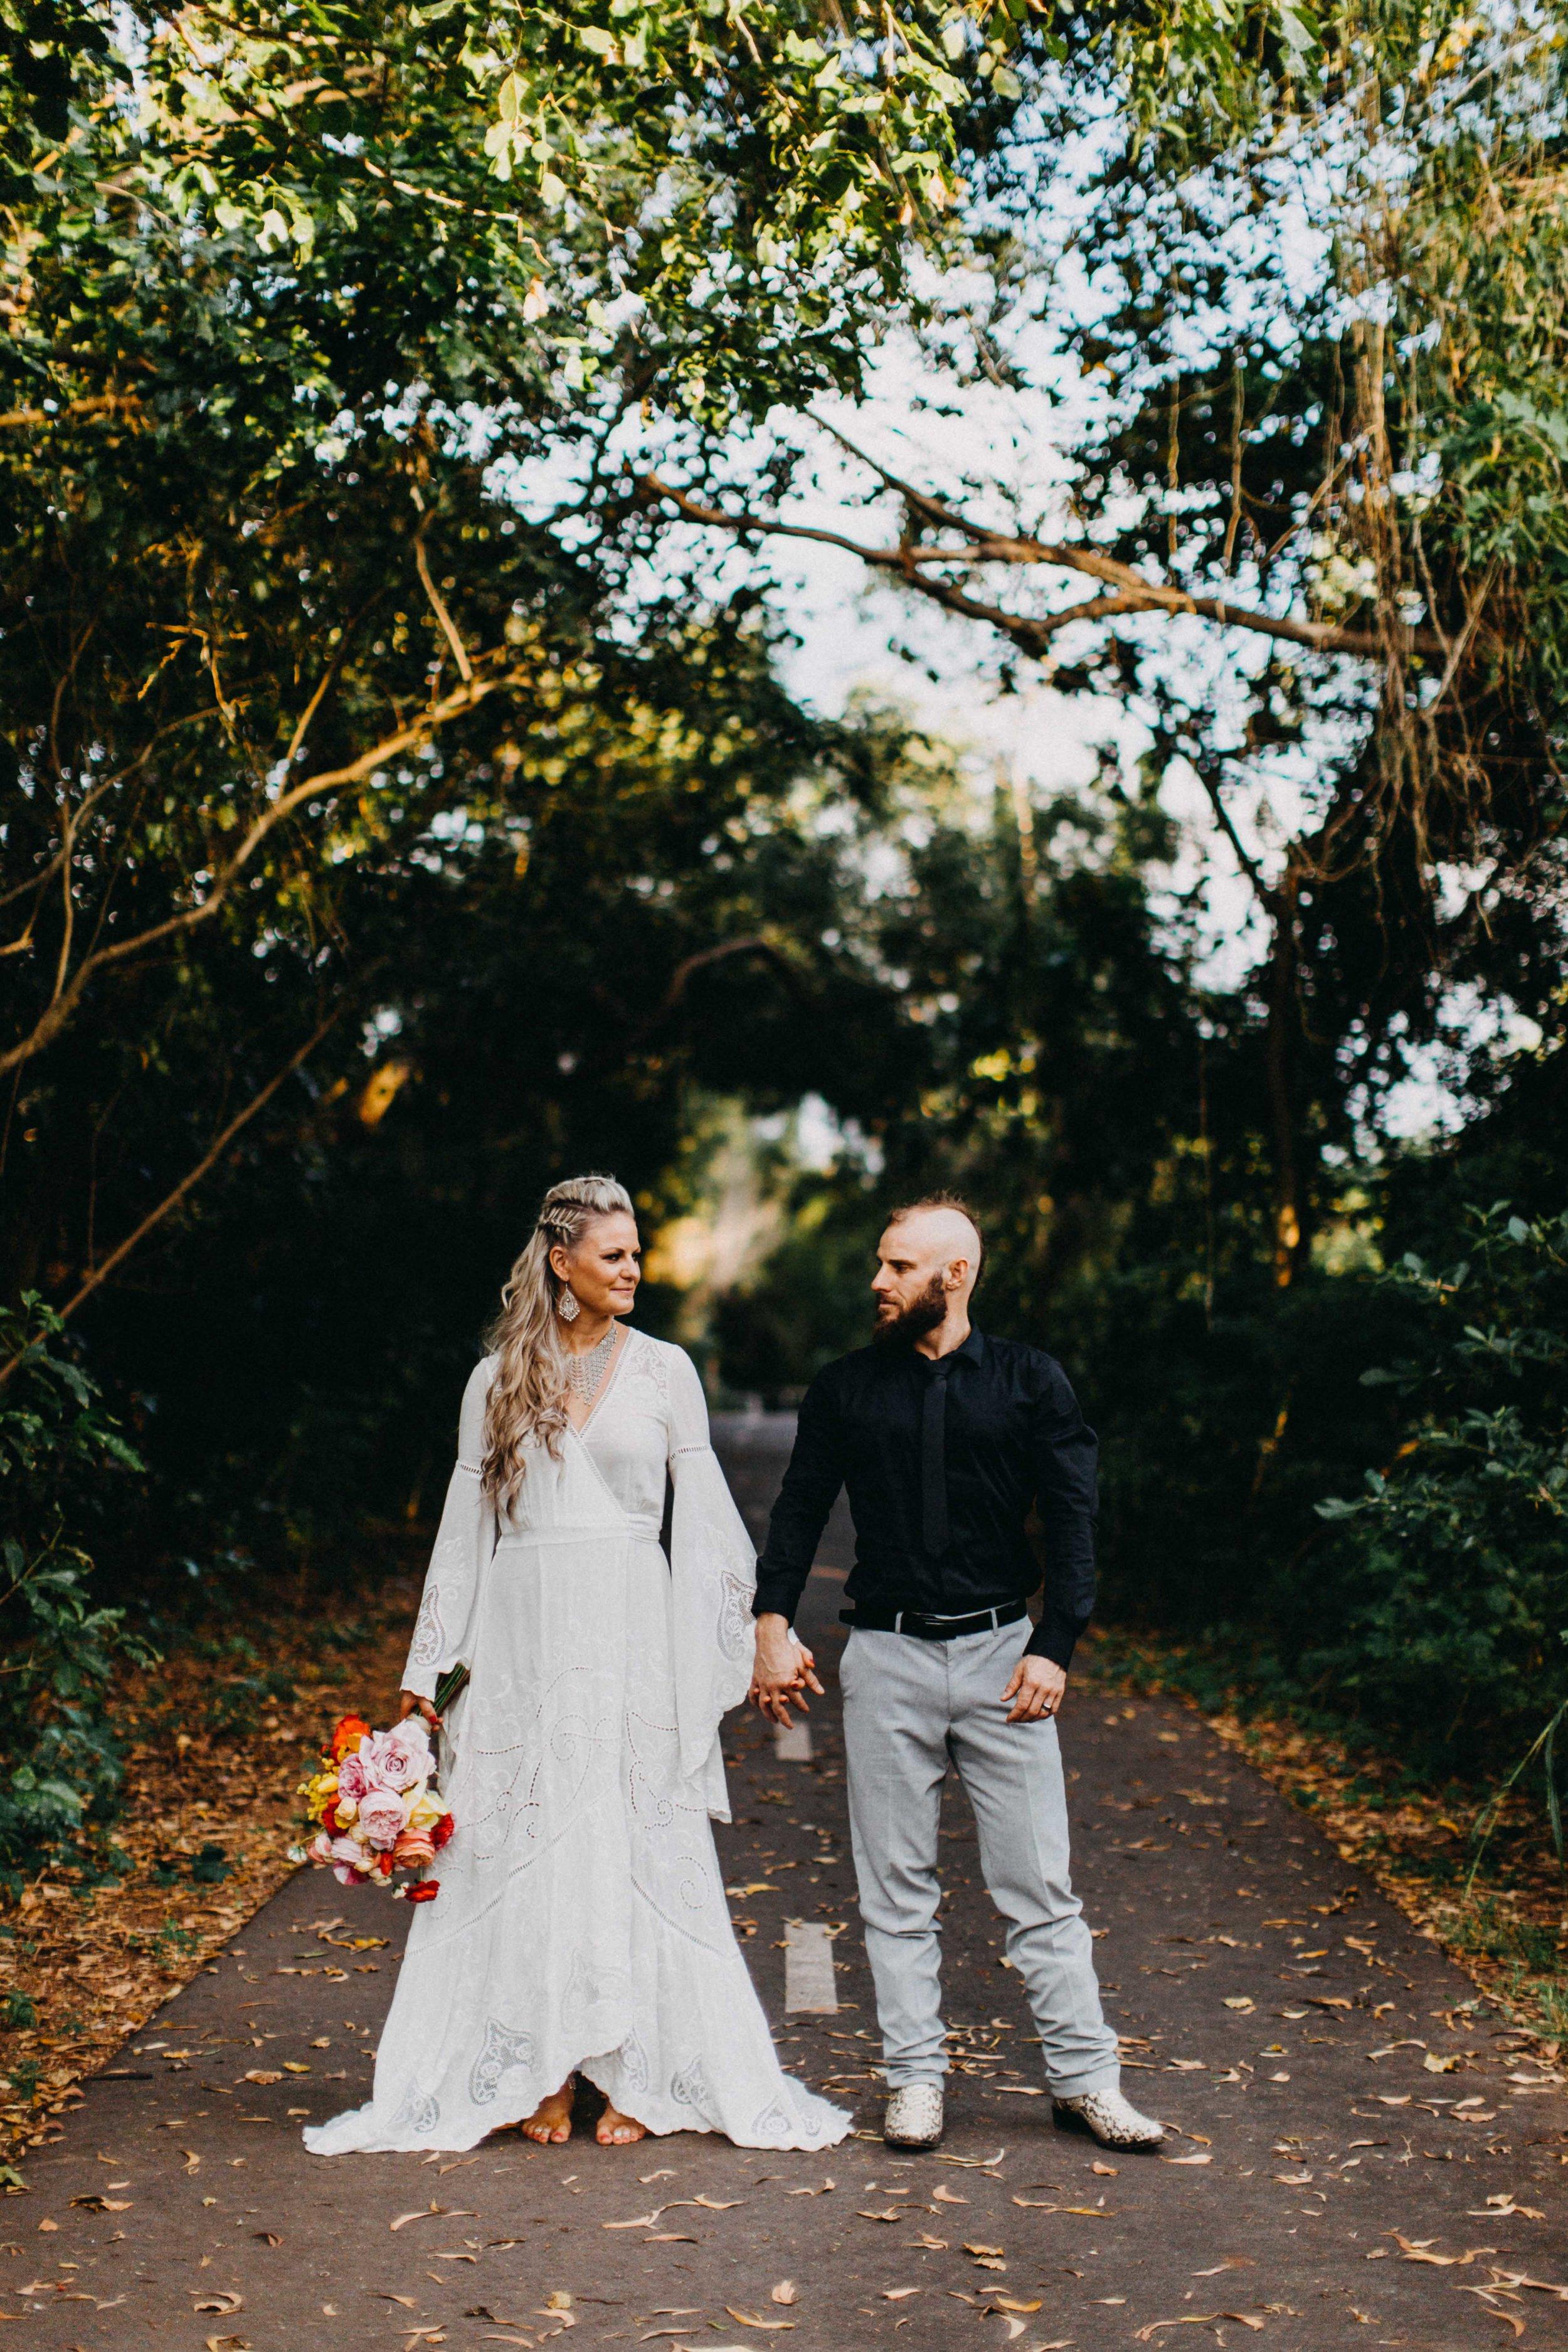 darwin-elopement-wedding-beach-camden-photography-www.emilyobrienphotography.net-58.jpg